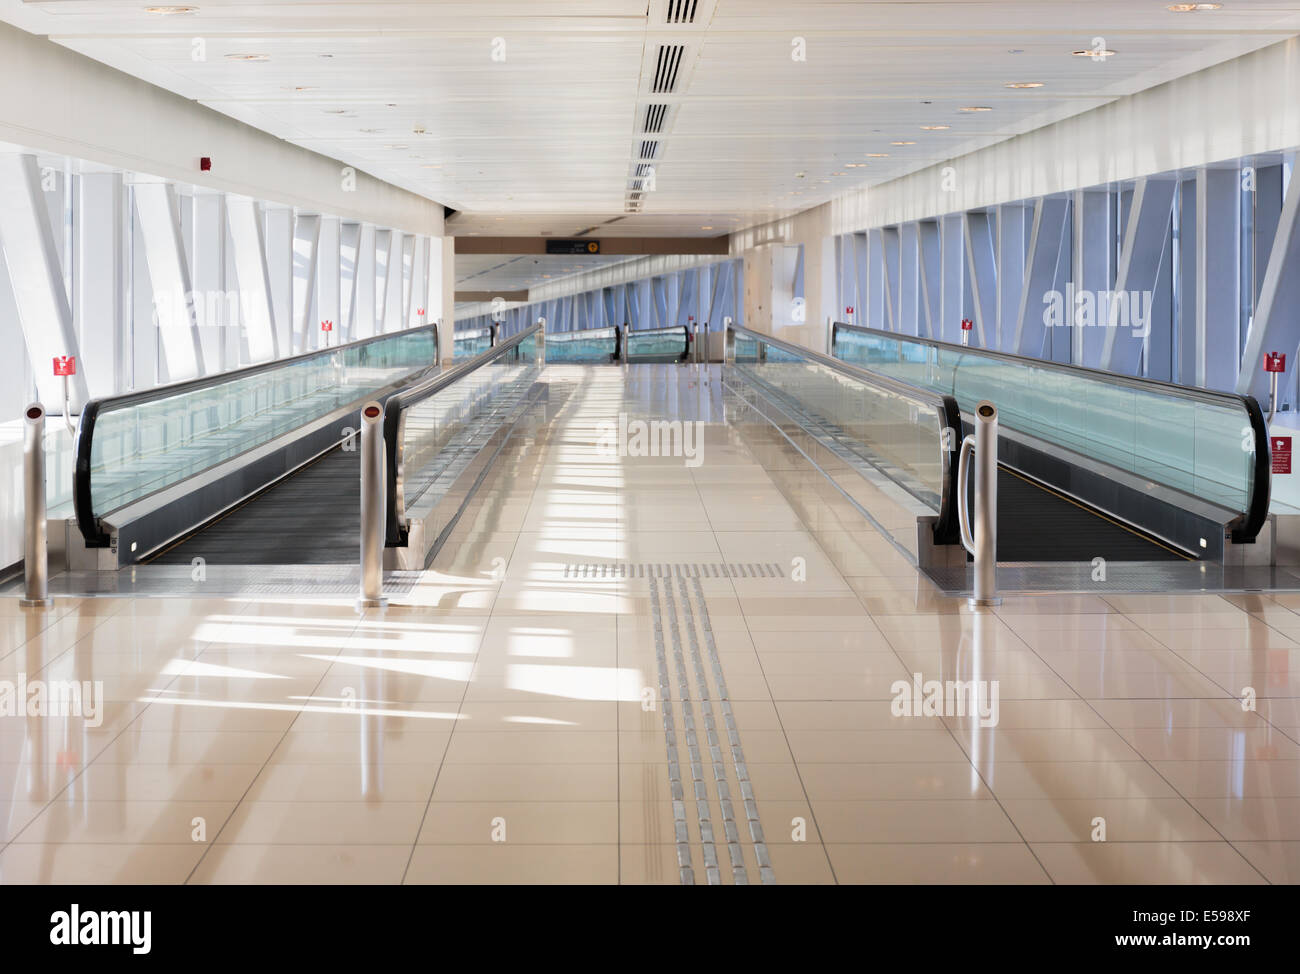 DUBAI, UAE - OCTOBER 31: Interior of metro station in Dubai. Metro as world's longest fully automated metro network (75 km) on O Stock Photo